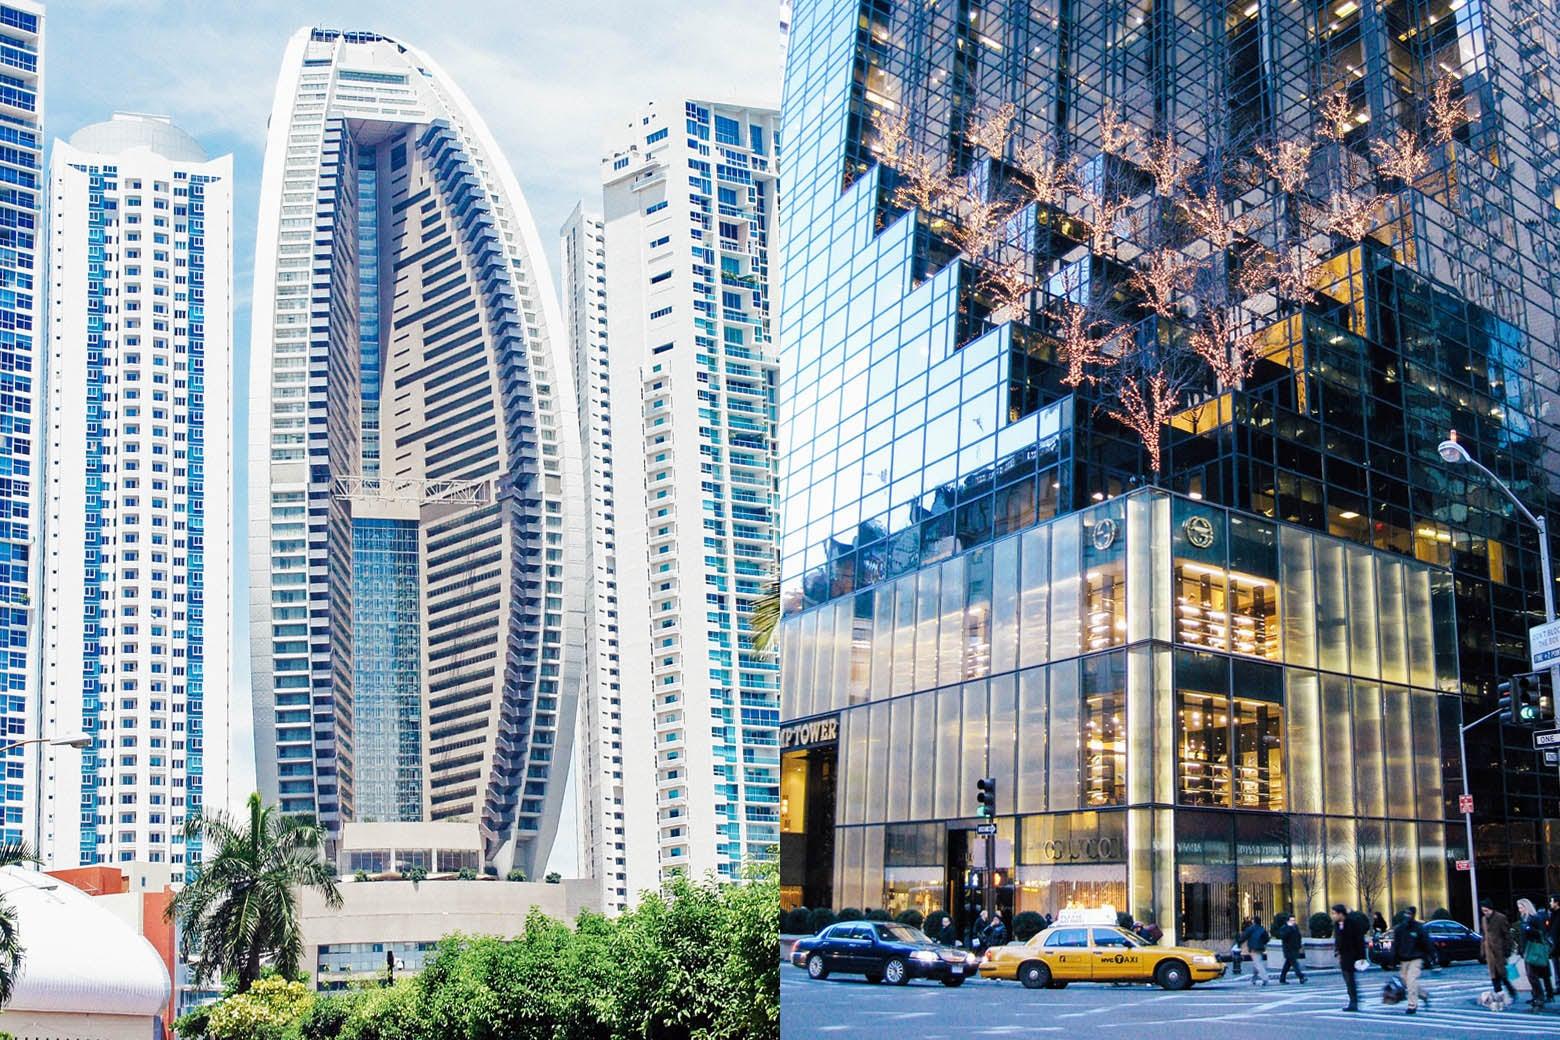 Trump Panama City Hotel, Trump Tower Manhattan.